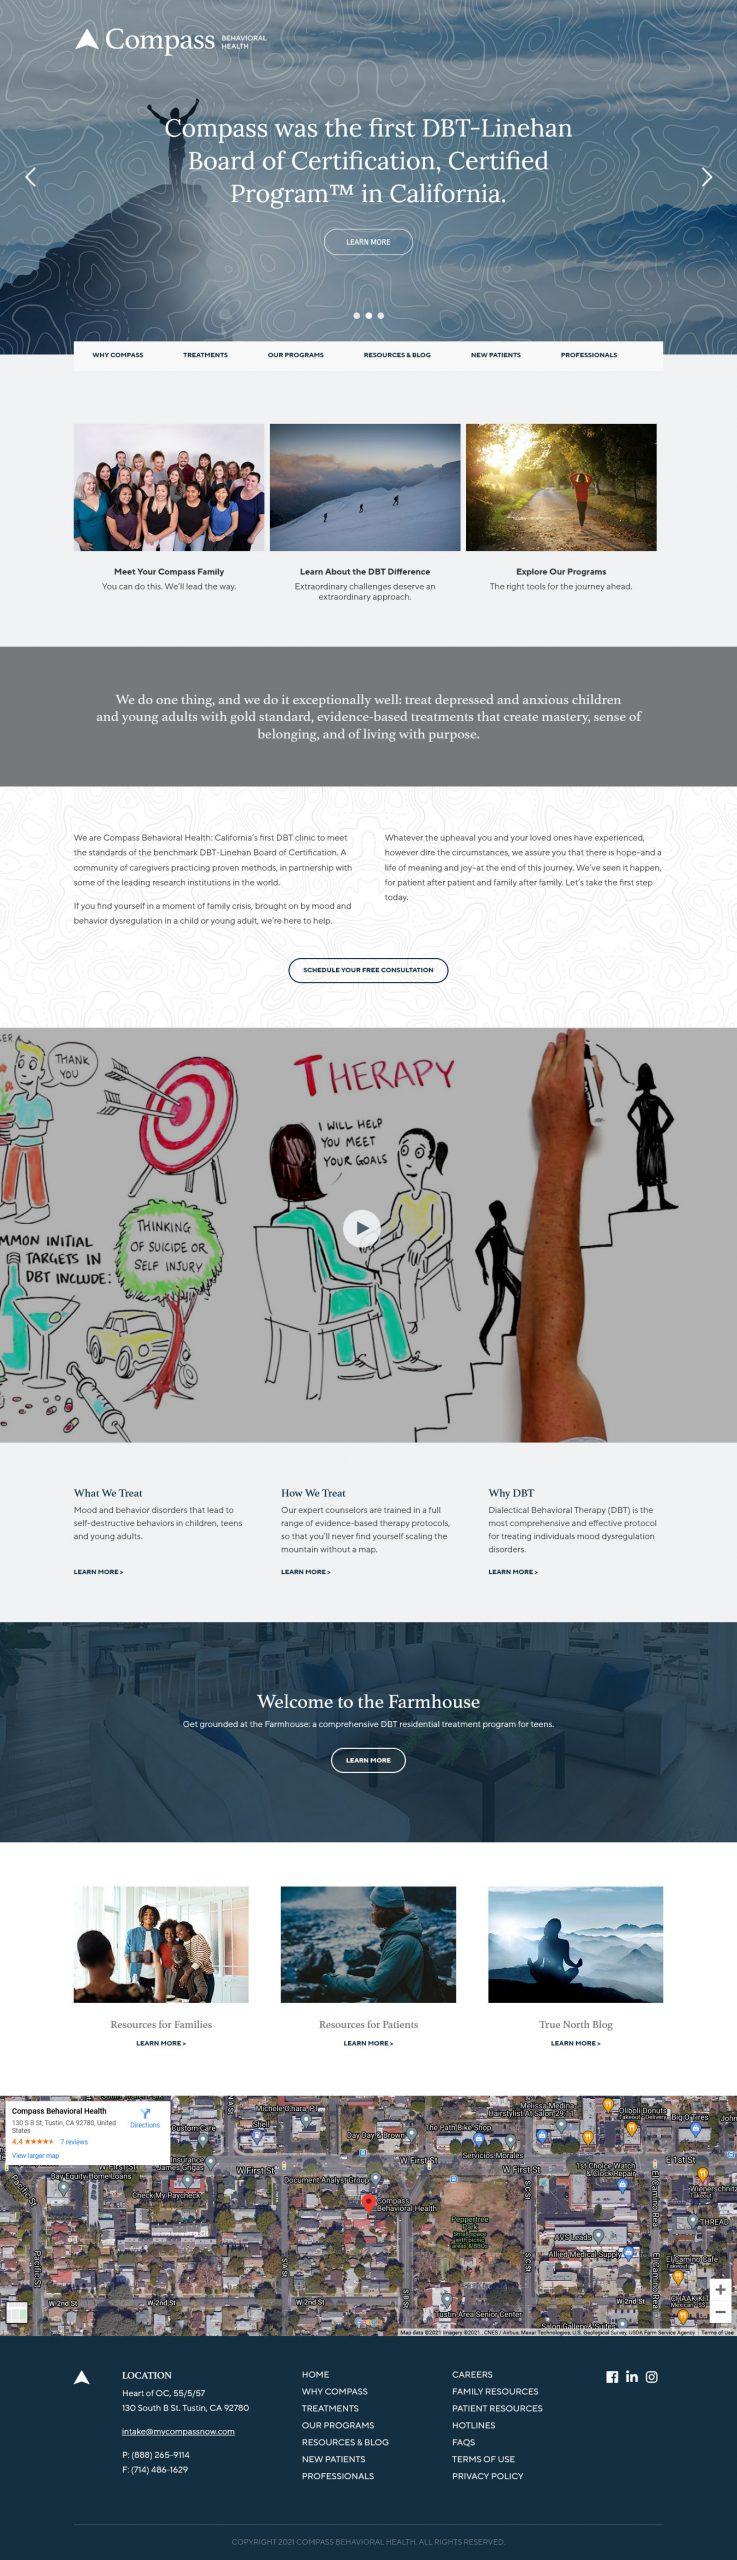 Compass Behavioral Health